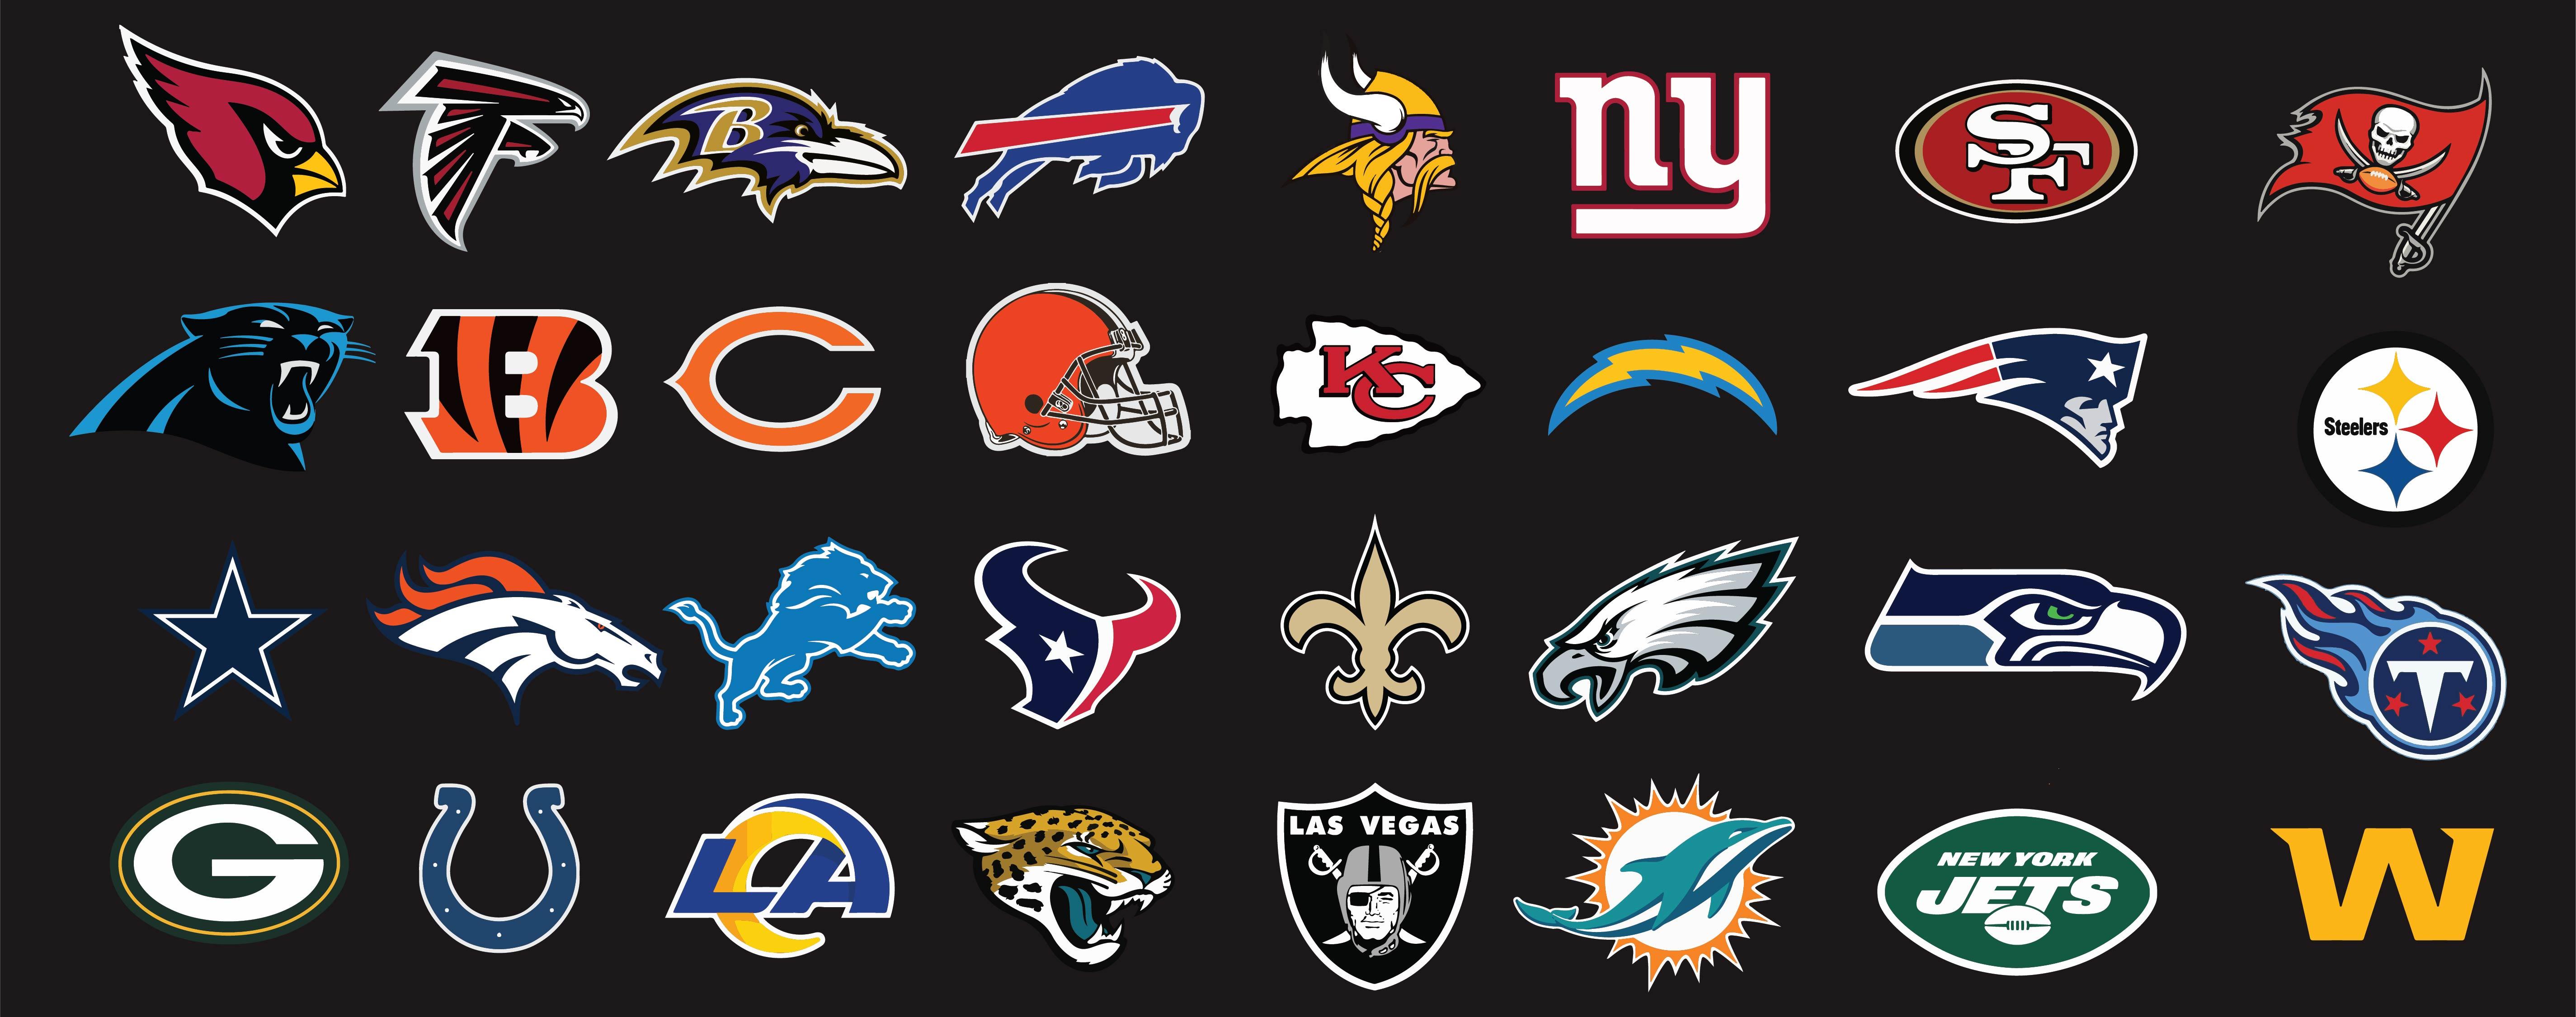 Printable NFL Football Team Logos